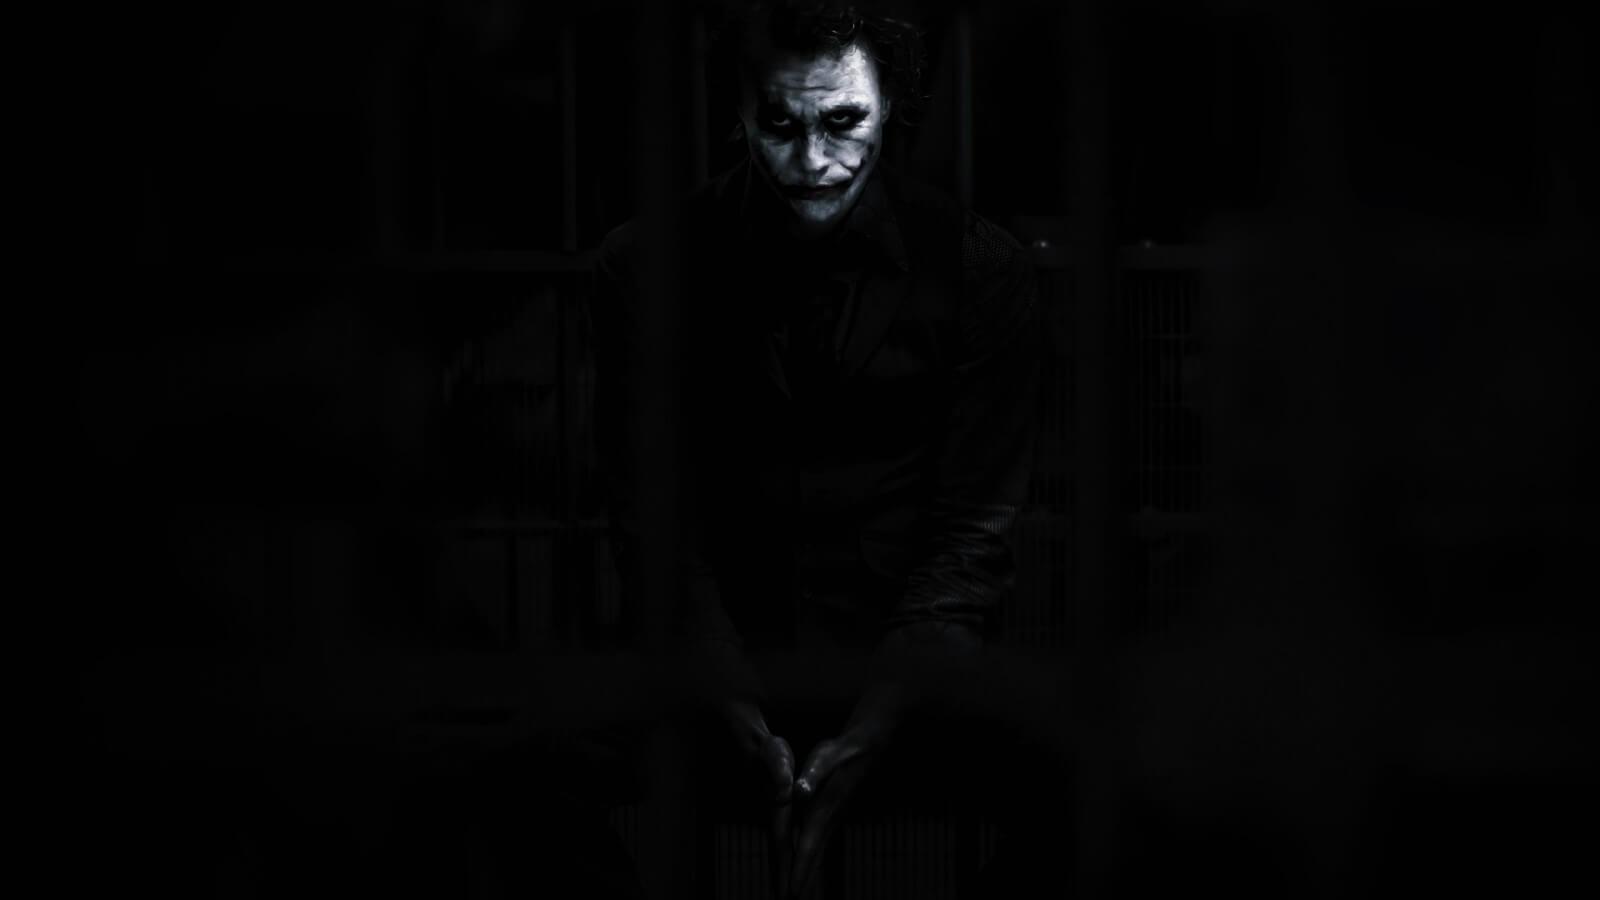 Joker Batman noir Heath Ledger The Dark Knight movies